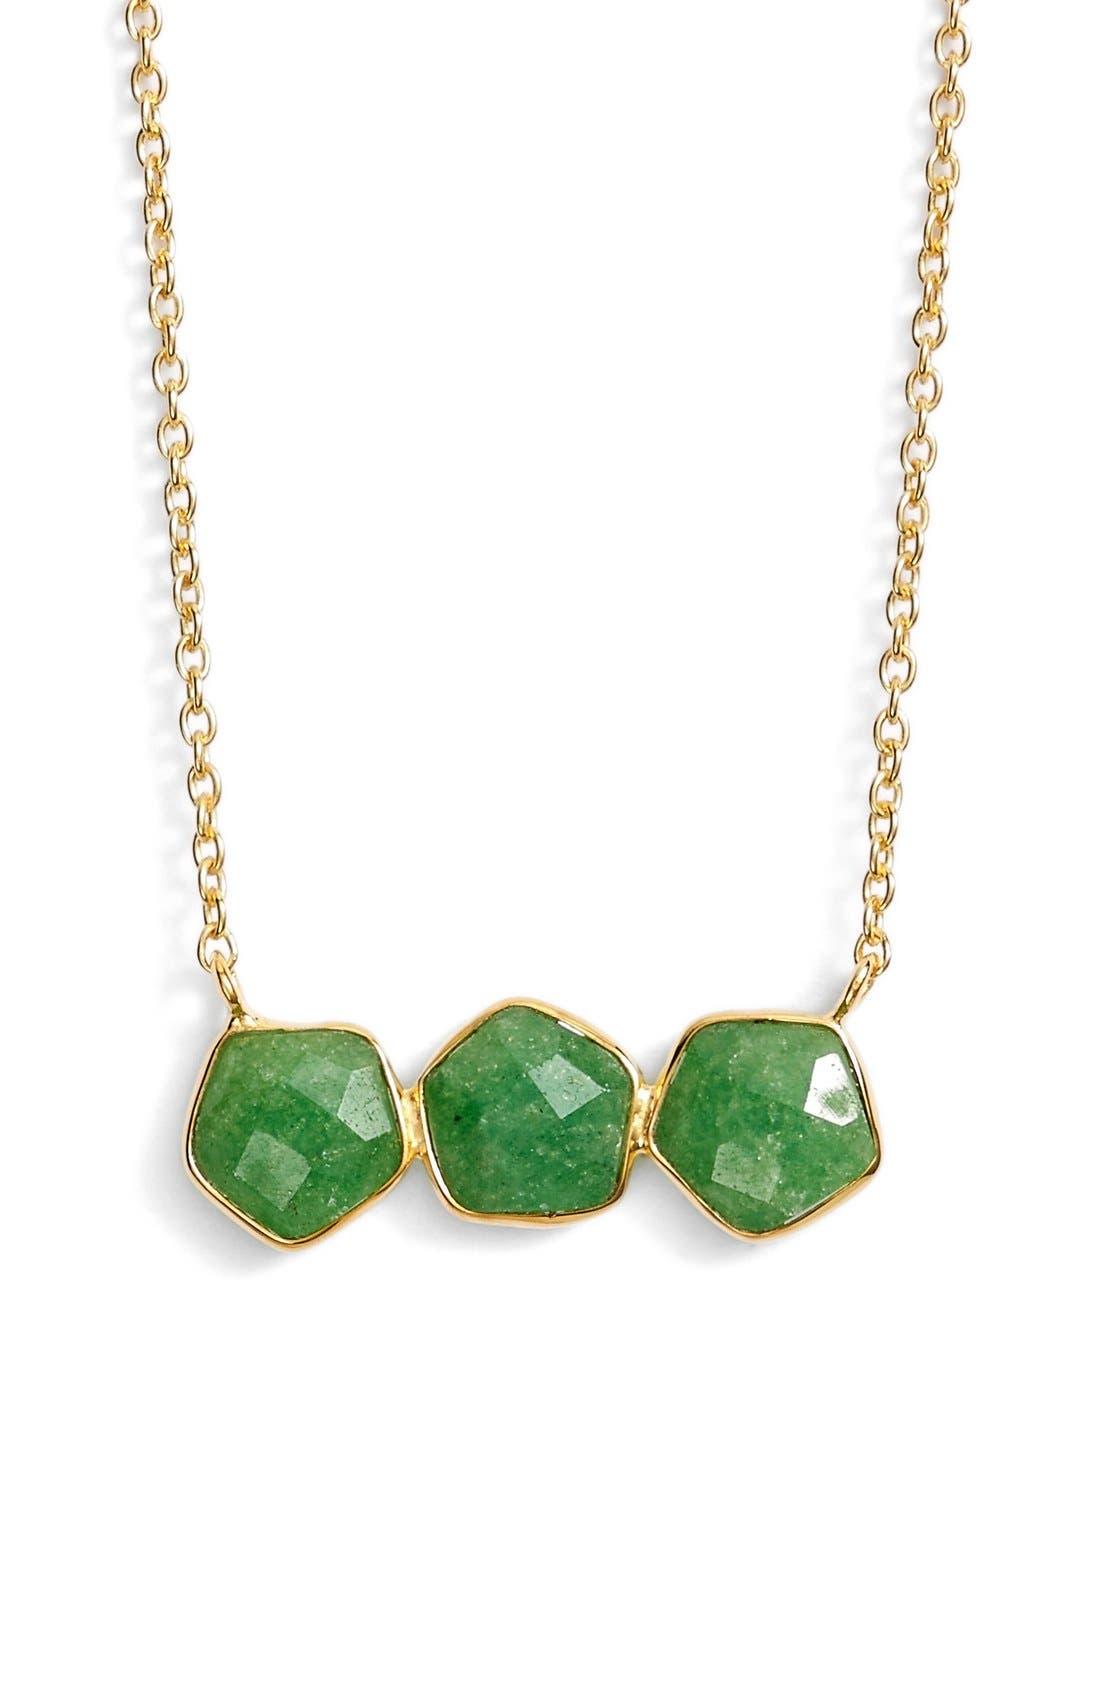 Alternate Image 1 Selected - ArgentoVivoThree Stone Frontal Necklace